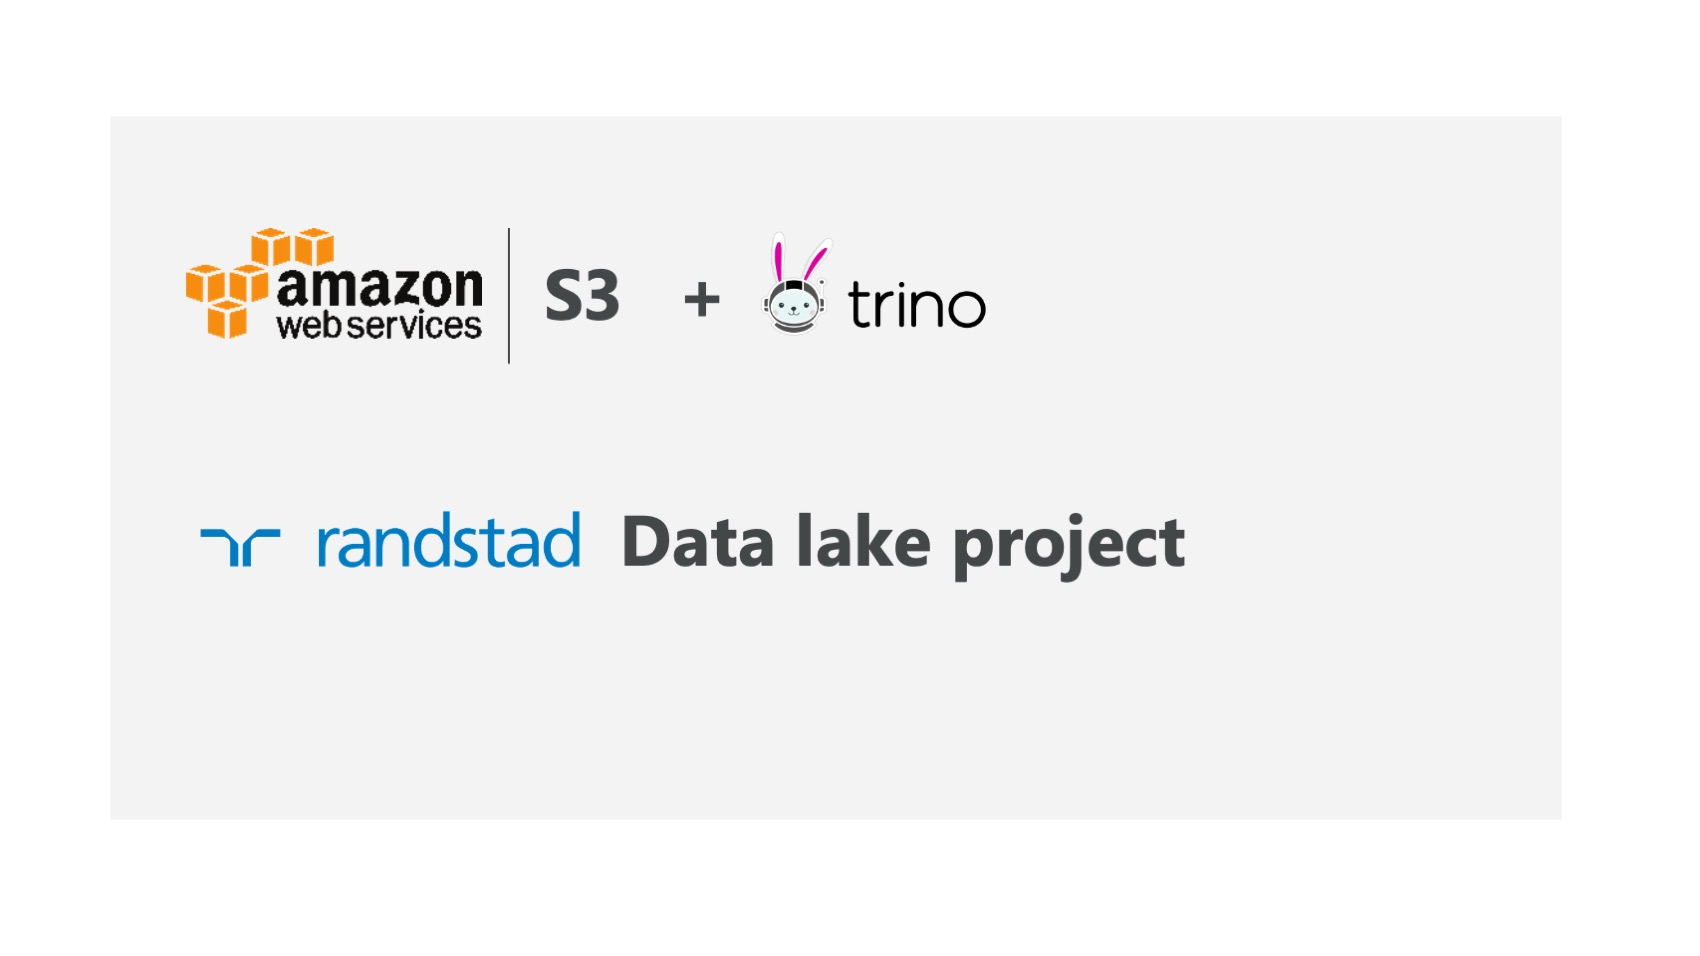 Randstad-AWS-data-lake-project